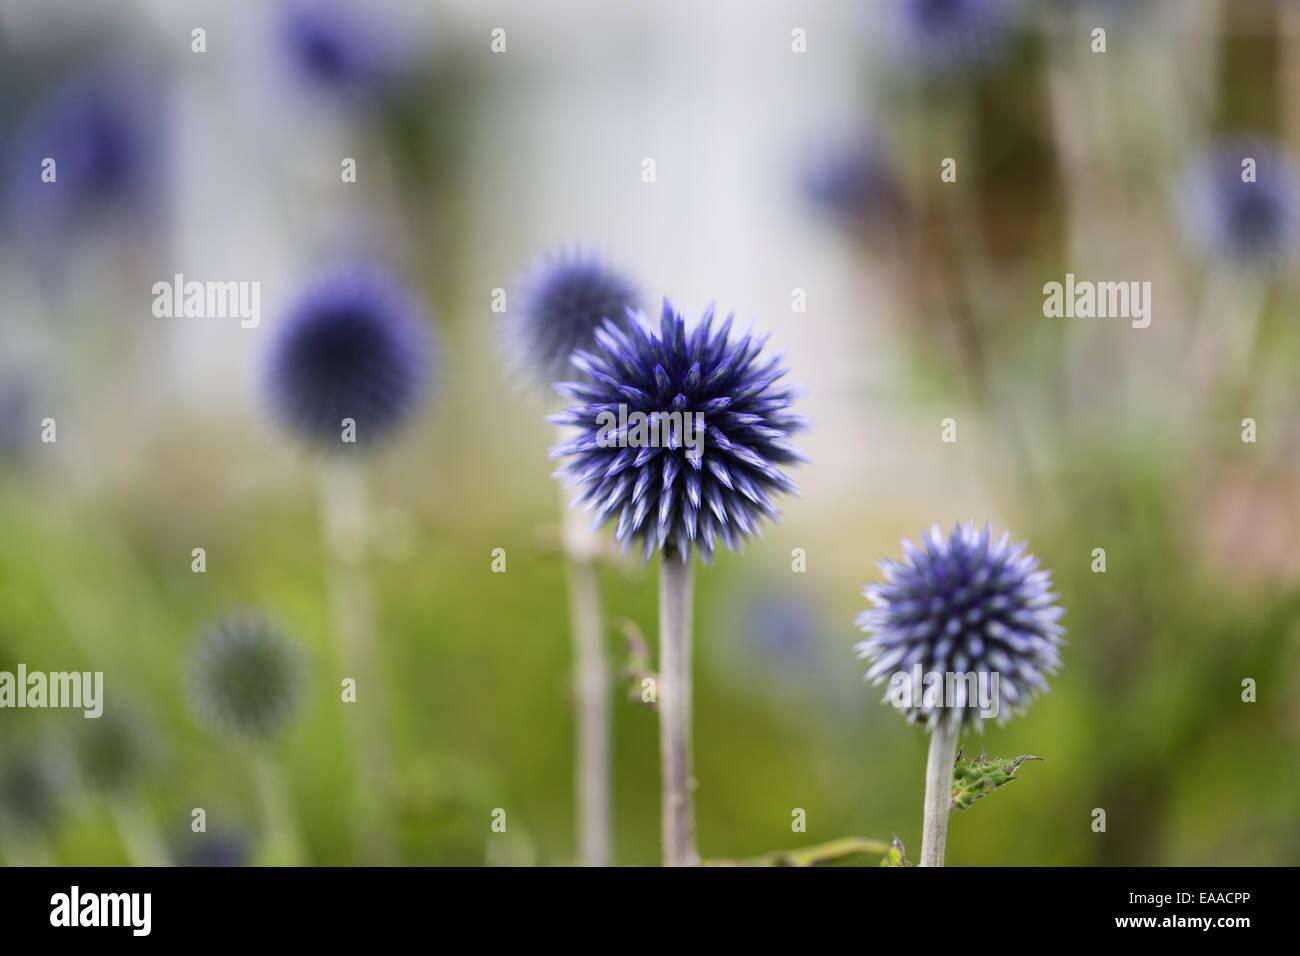 Echinops bannaticus 'Taplow Blue' - Stock Image